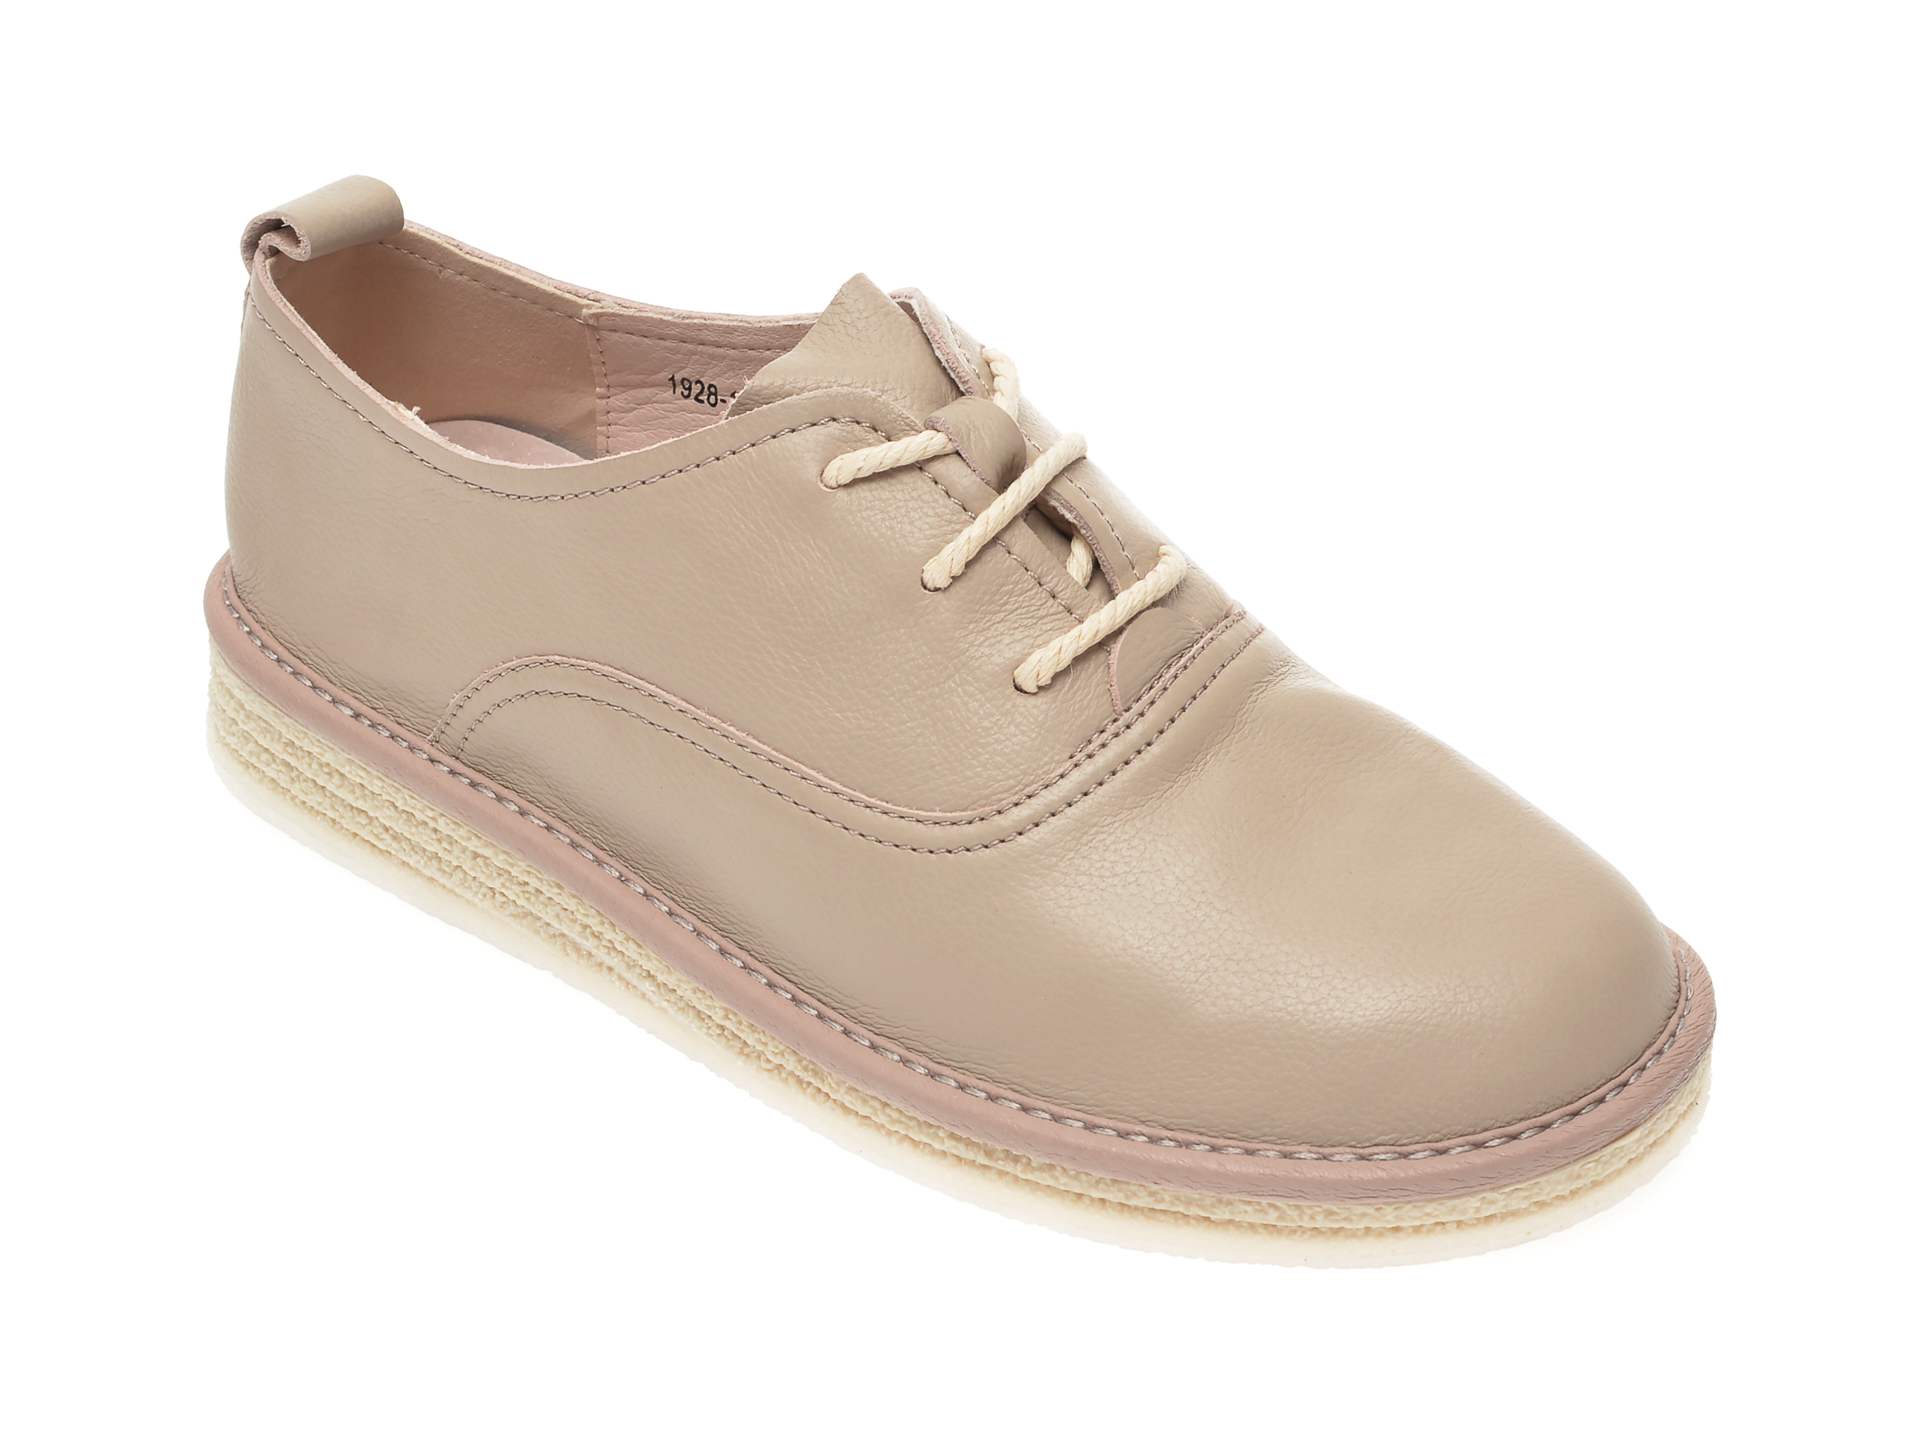 Pantofi IMAGE gri, 1928, din piele naturala